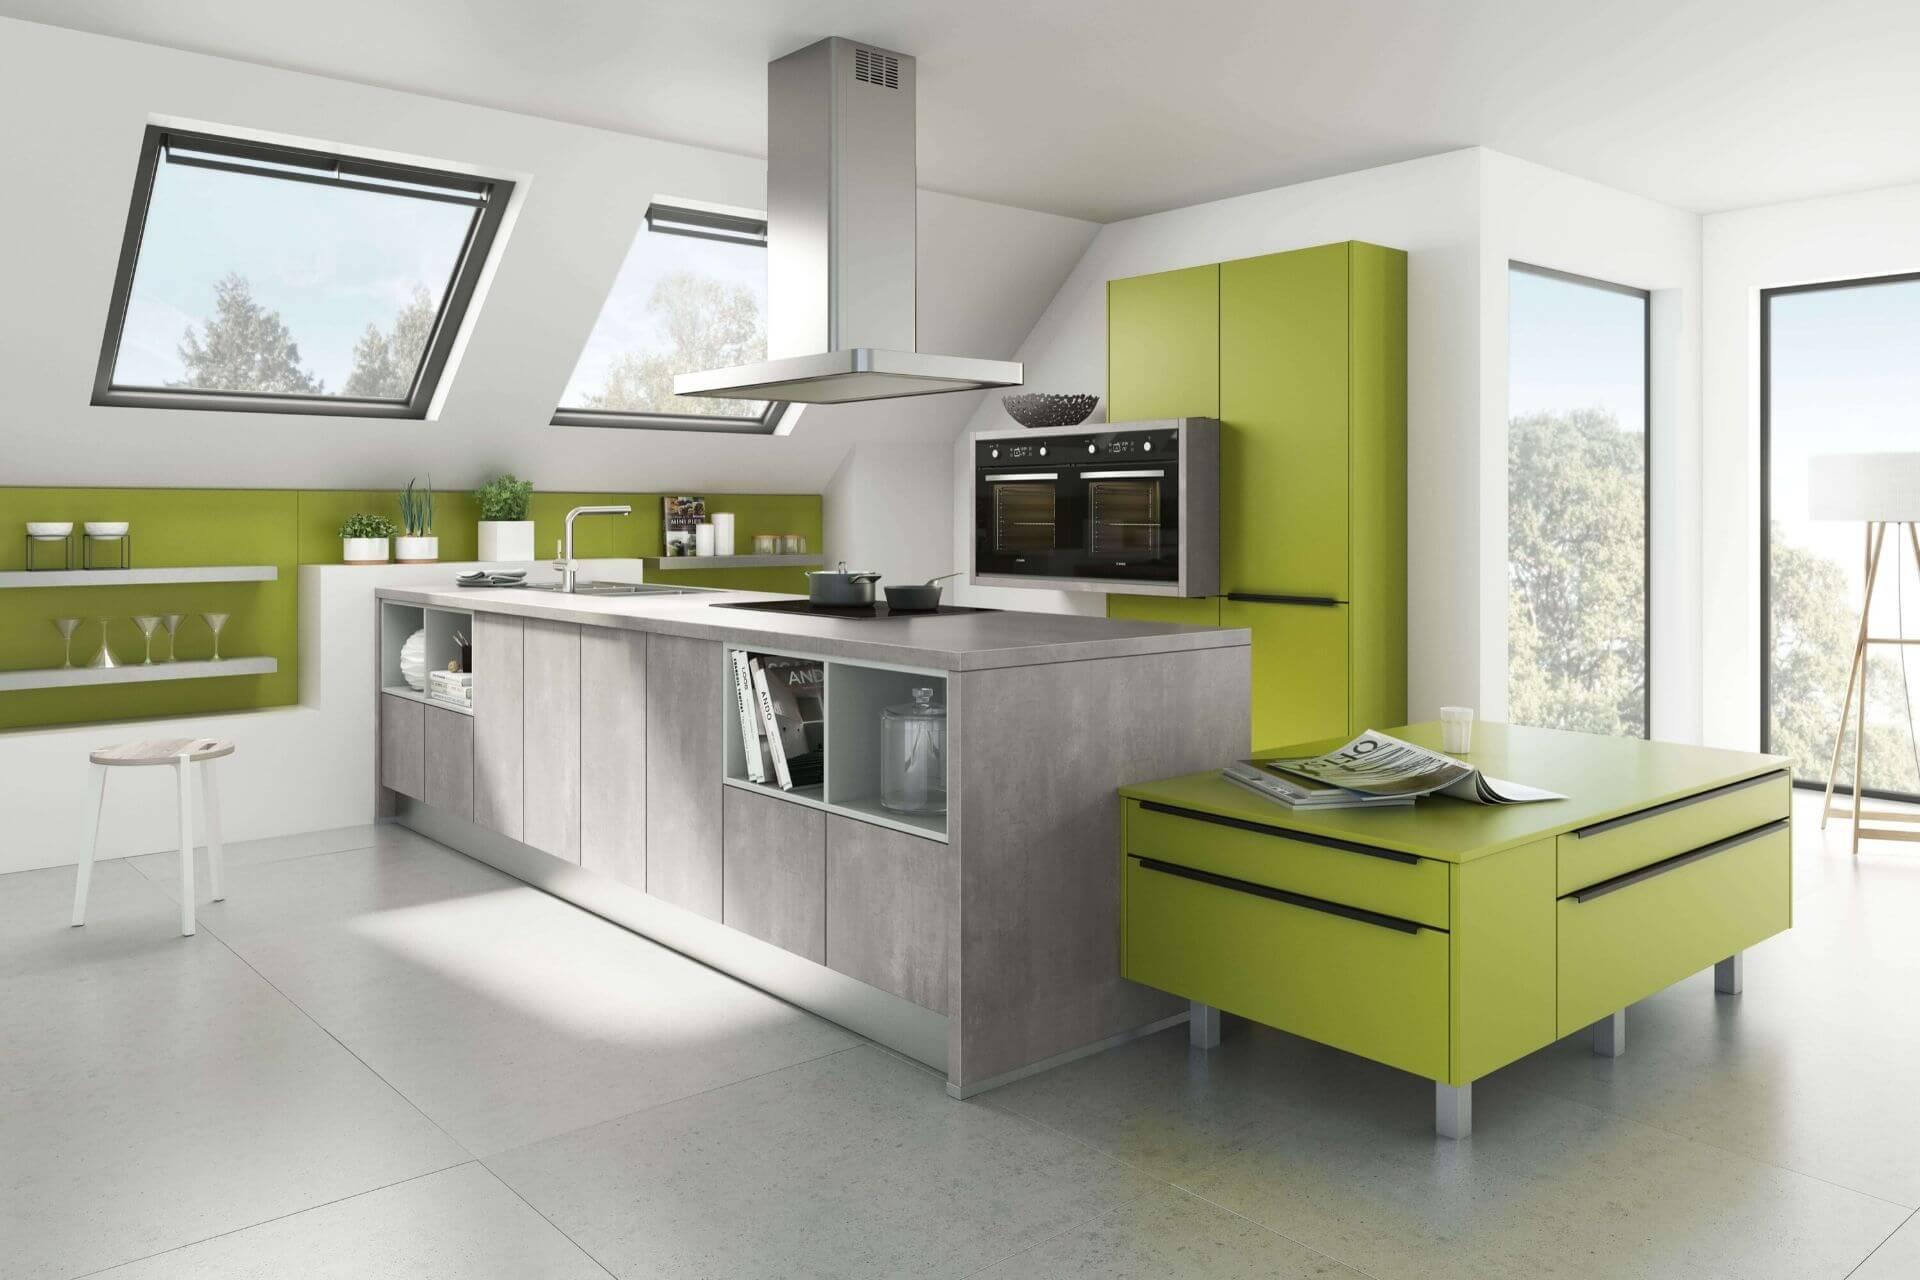 Cocinas con Isla - Cocinas con Península - Murcia | KEYS DISEÑO